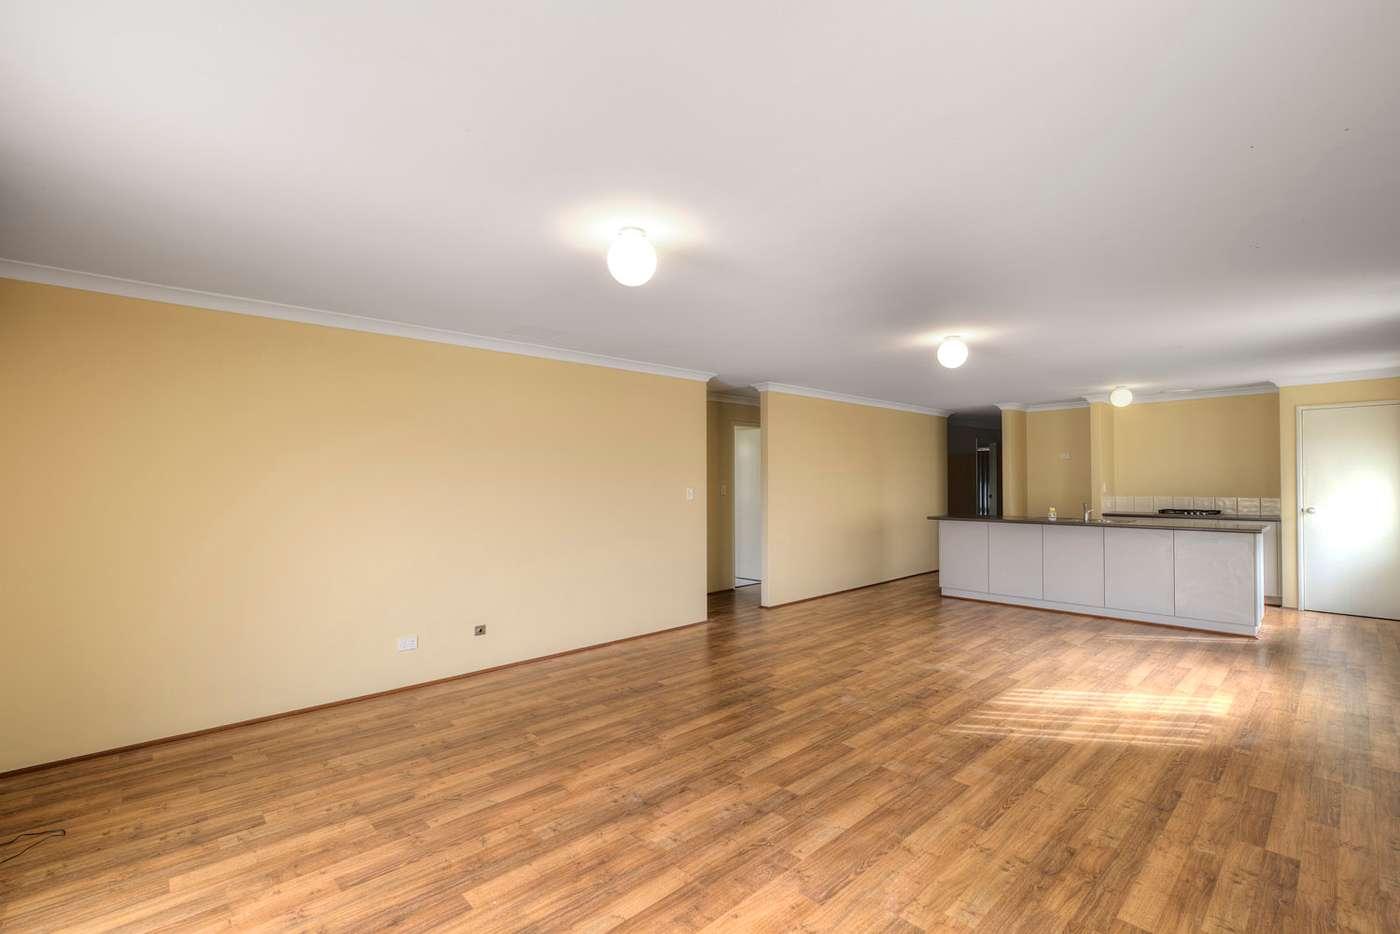 Sixth view of Homely house listing, 4 Kalbarri Avenue, Yanchep WA 6035